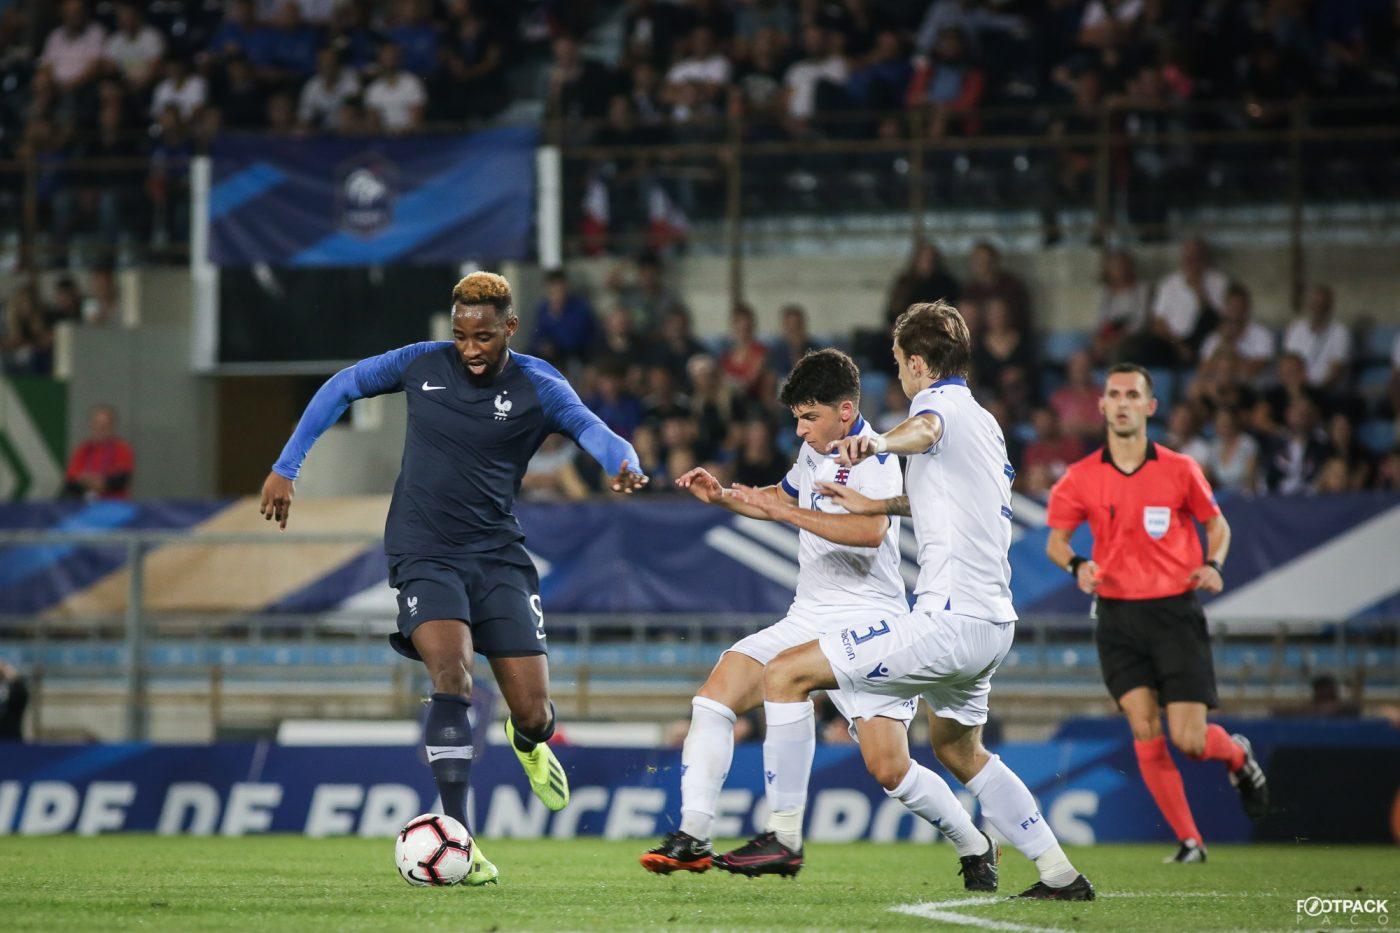 moussa-dembele-equipe-de-france-espoirs-euro-espoirs-2019